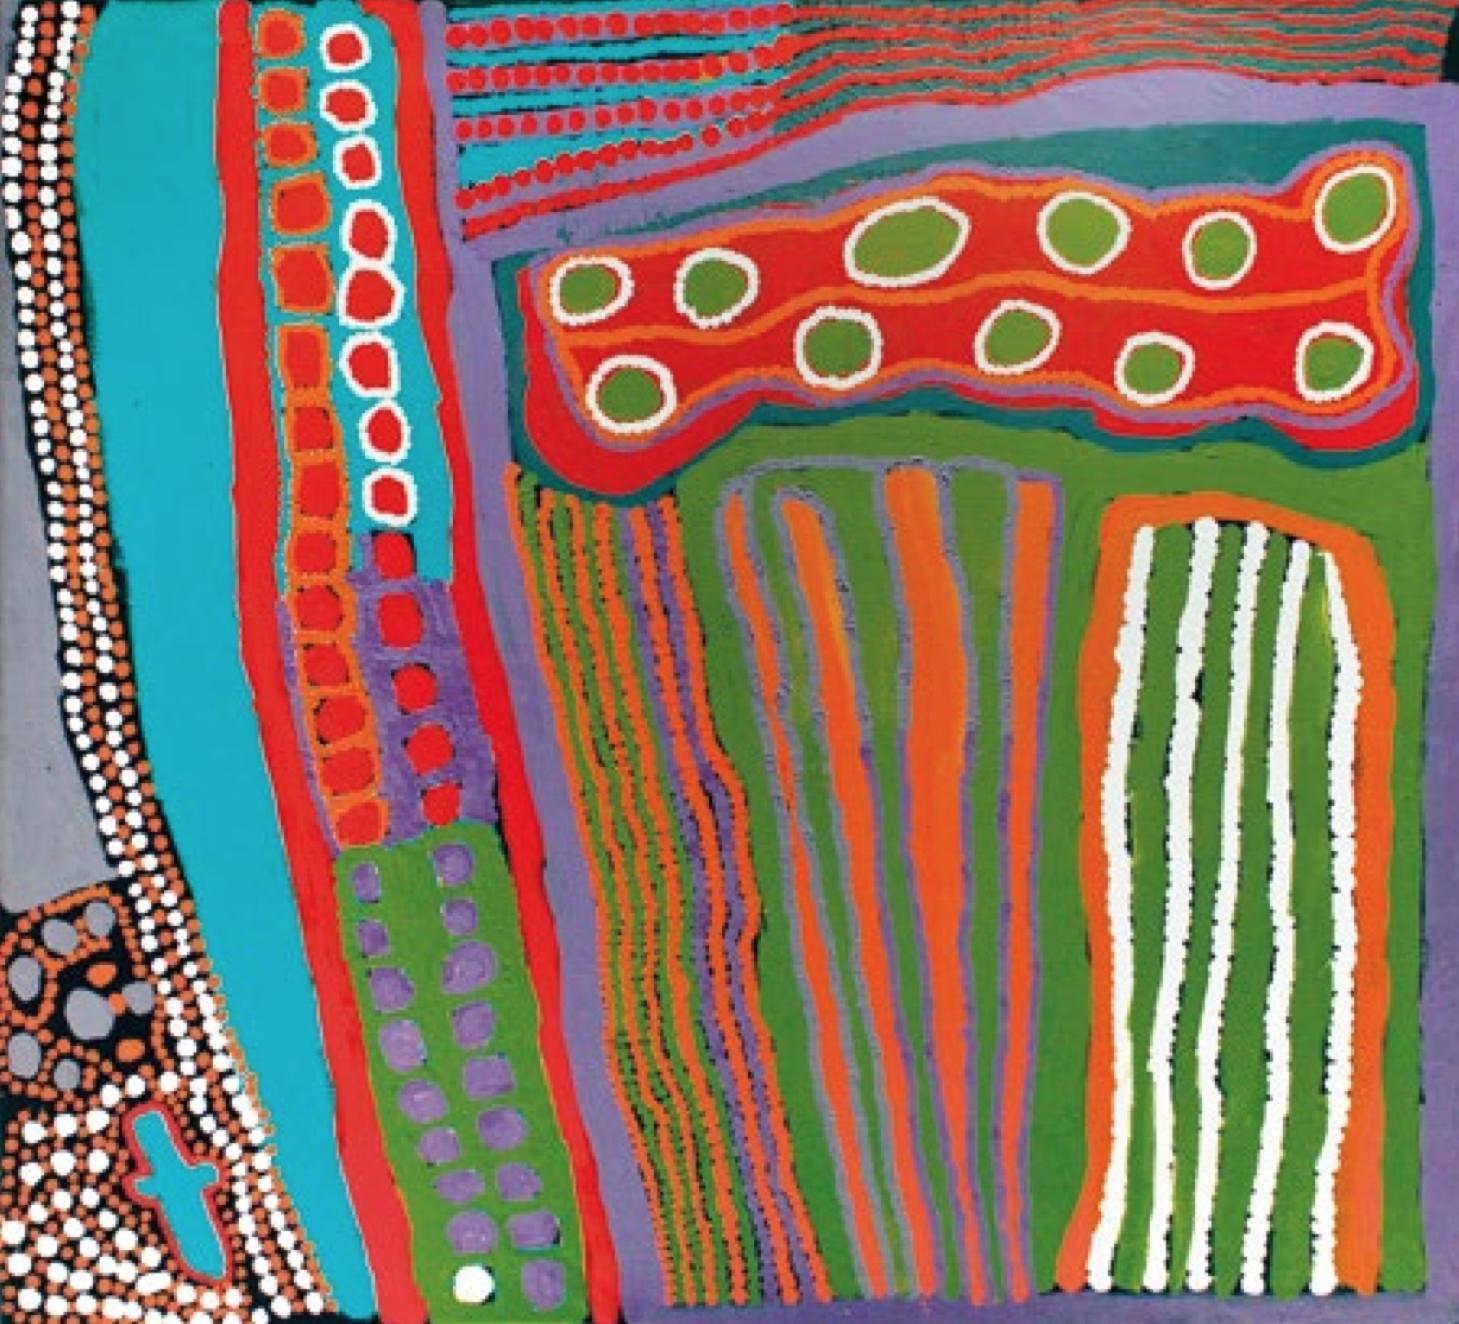 Earth Wind and Fire, Aboriginal Australian Art.